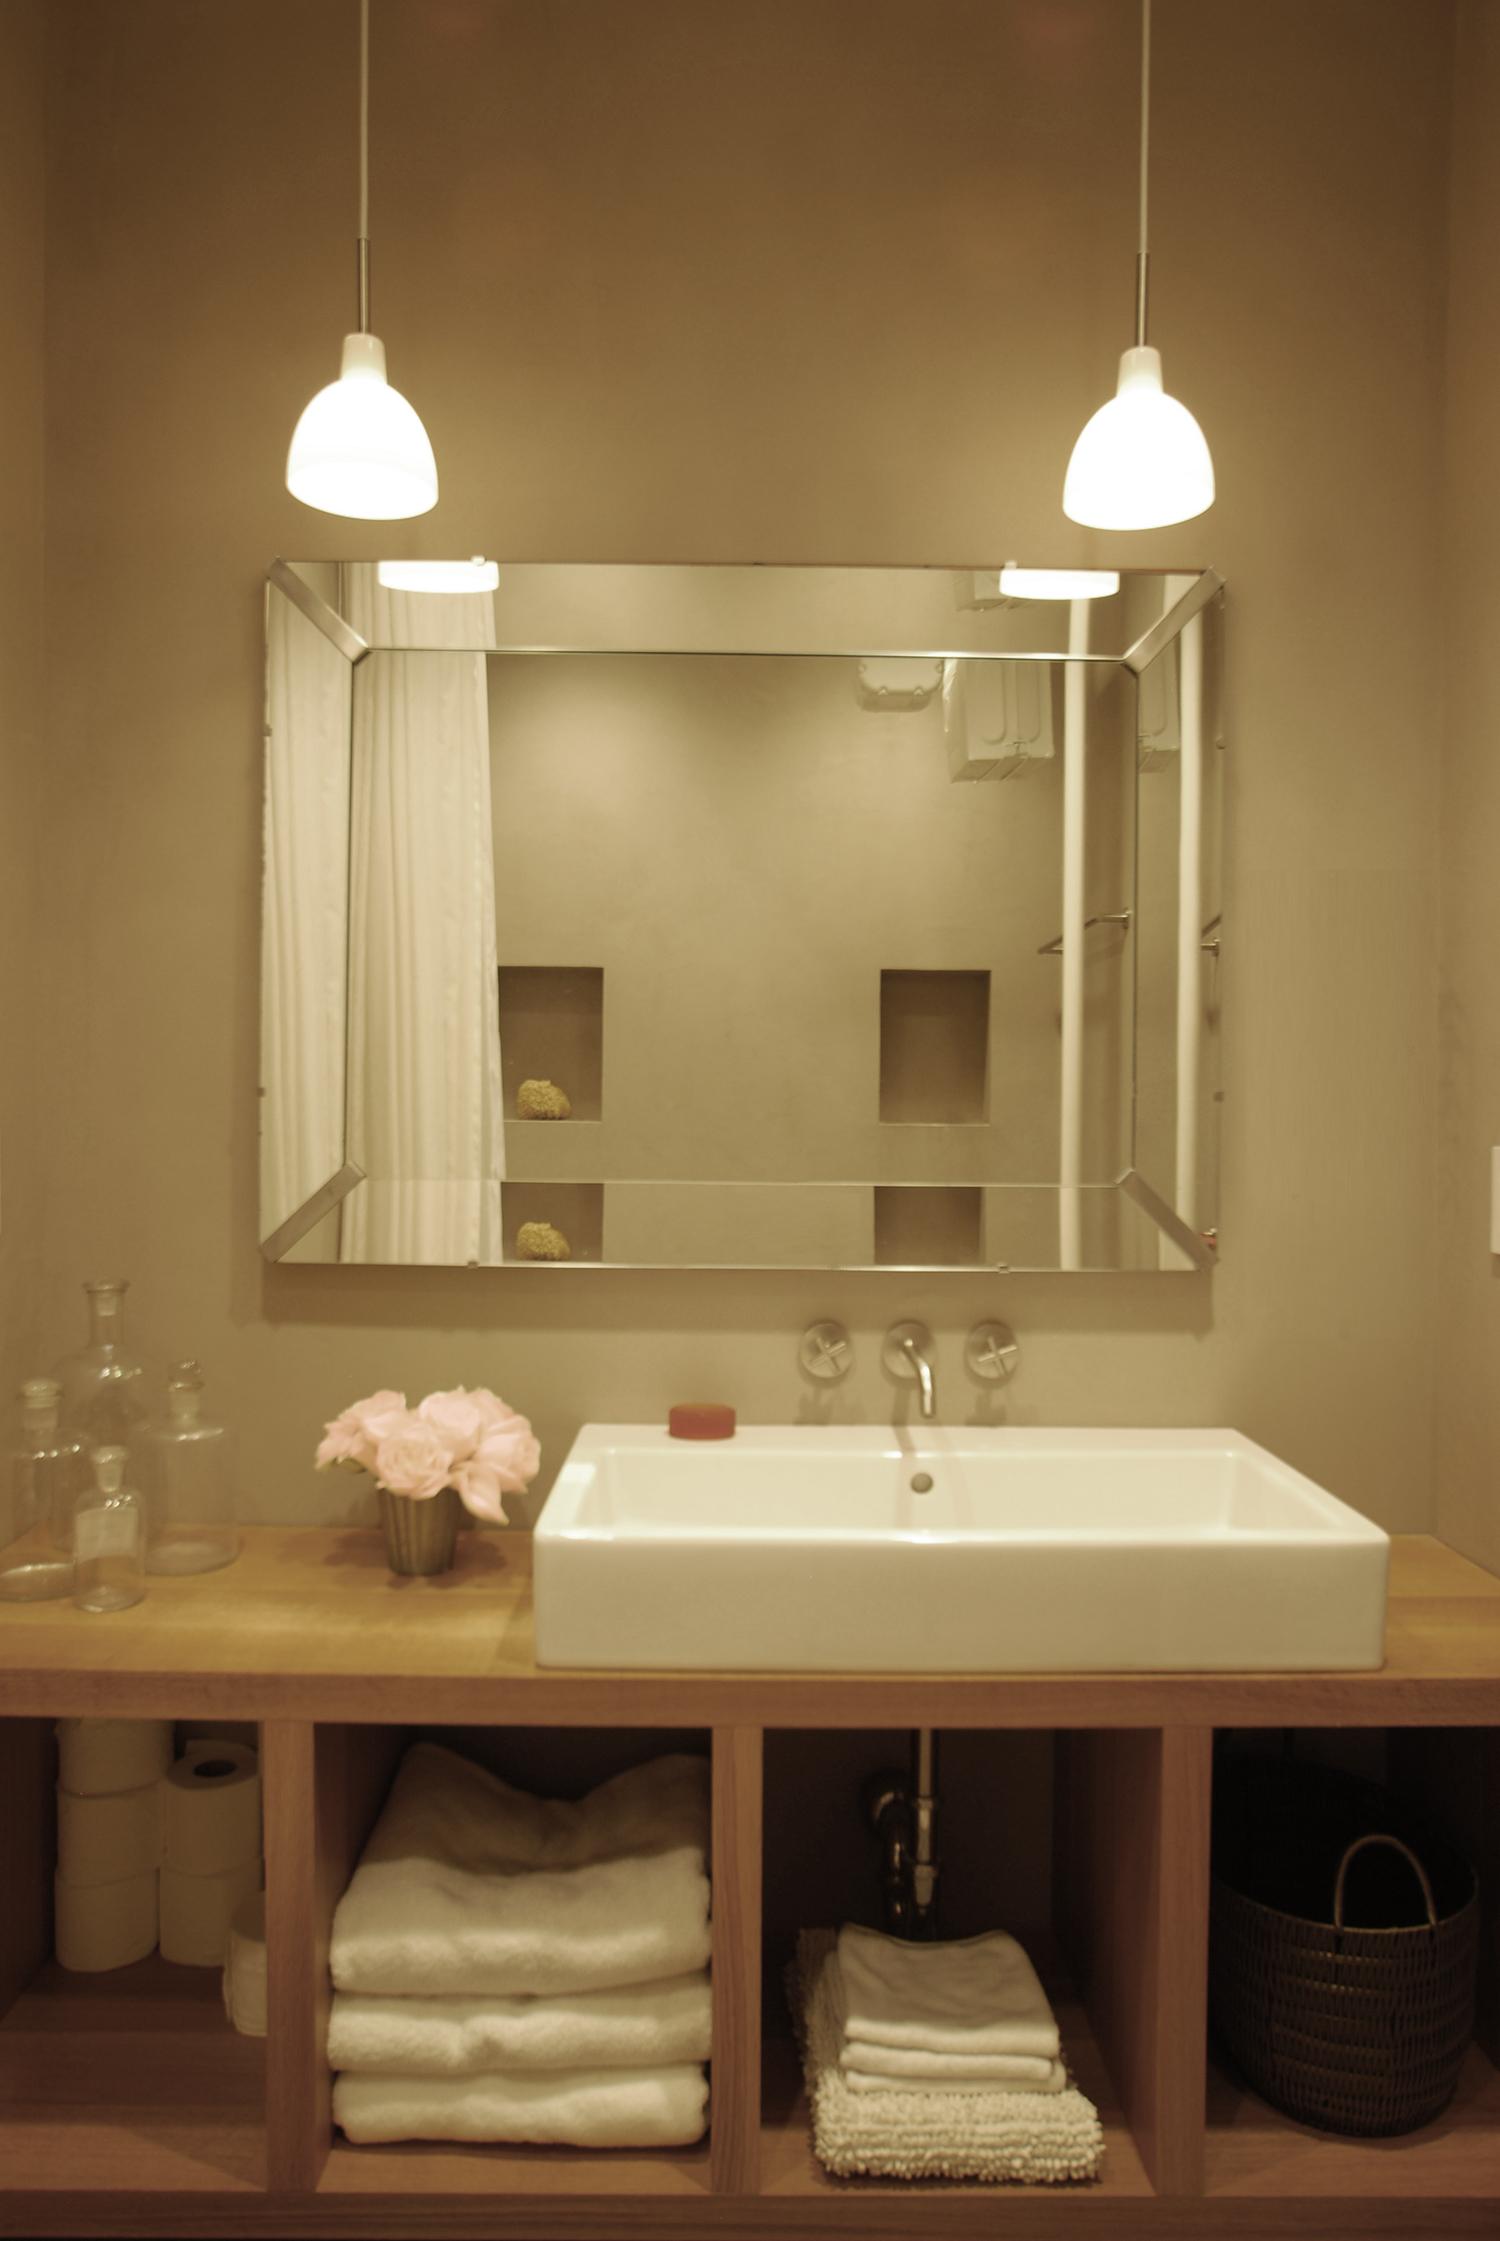 DSC_0027_Bathroom_photoshopped.jpg